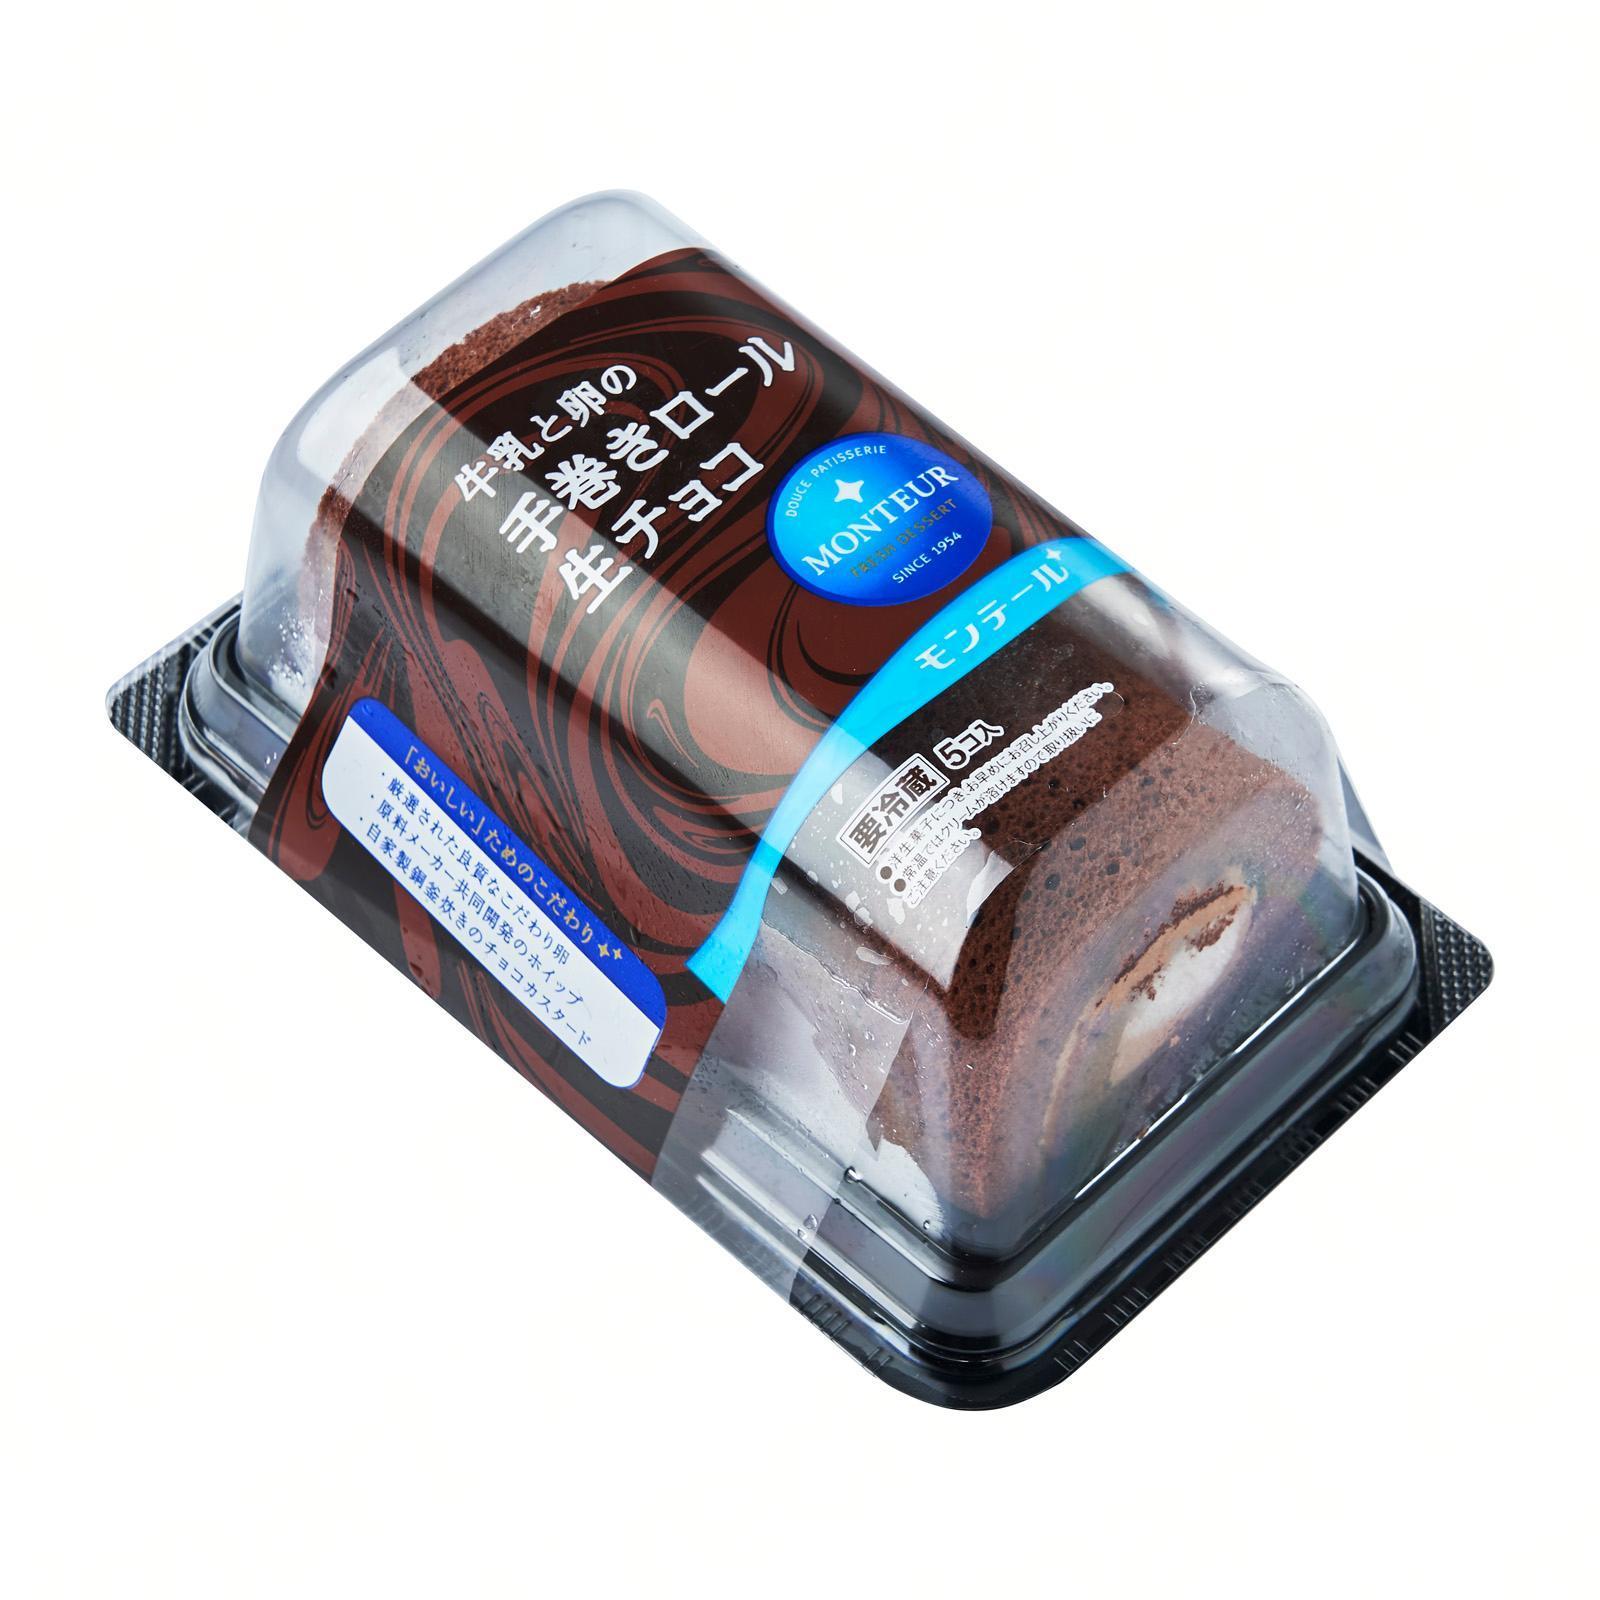 Monteur Chocolate Roll Cake - by J-mart Japanese Food Market -Frozen